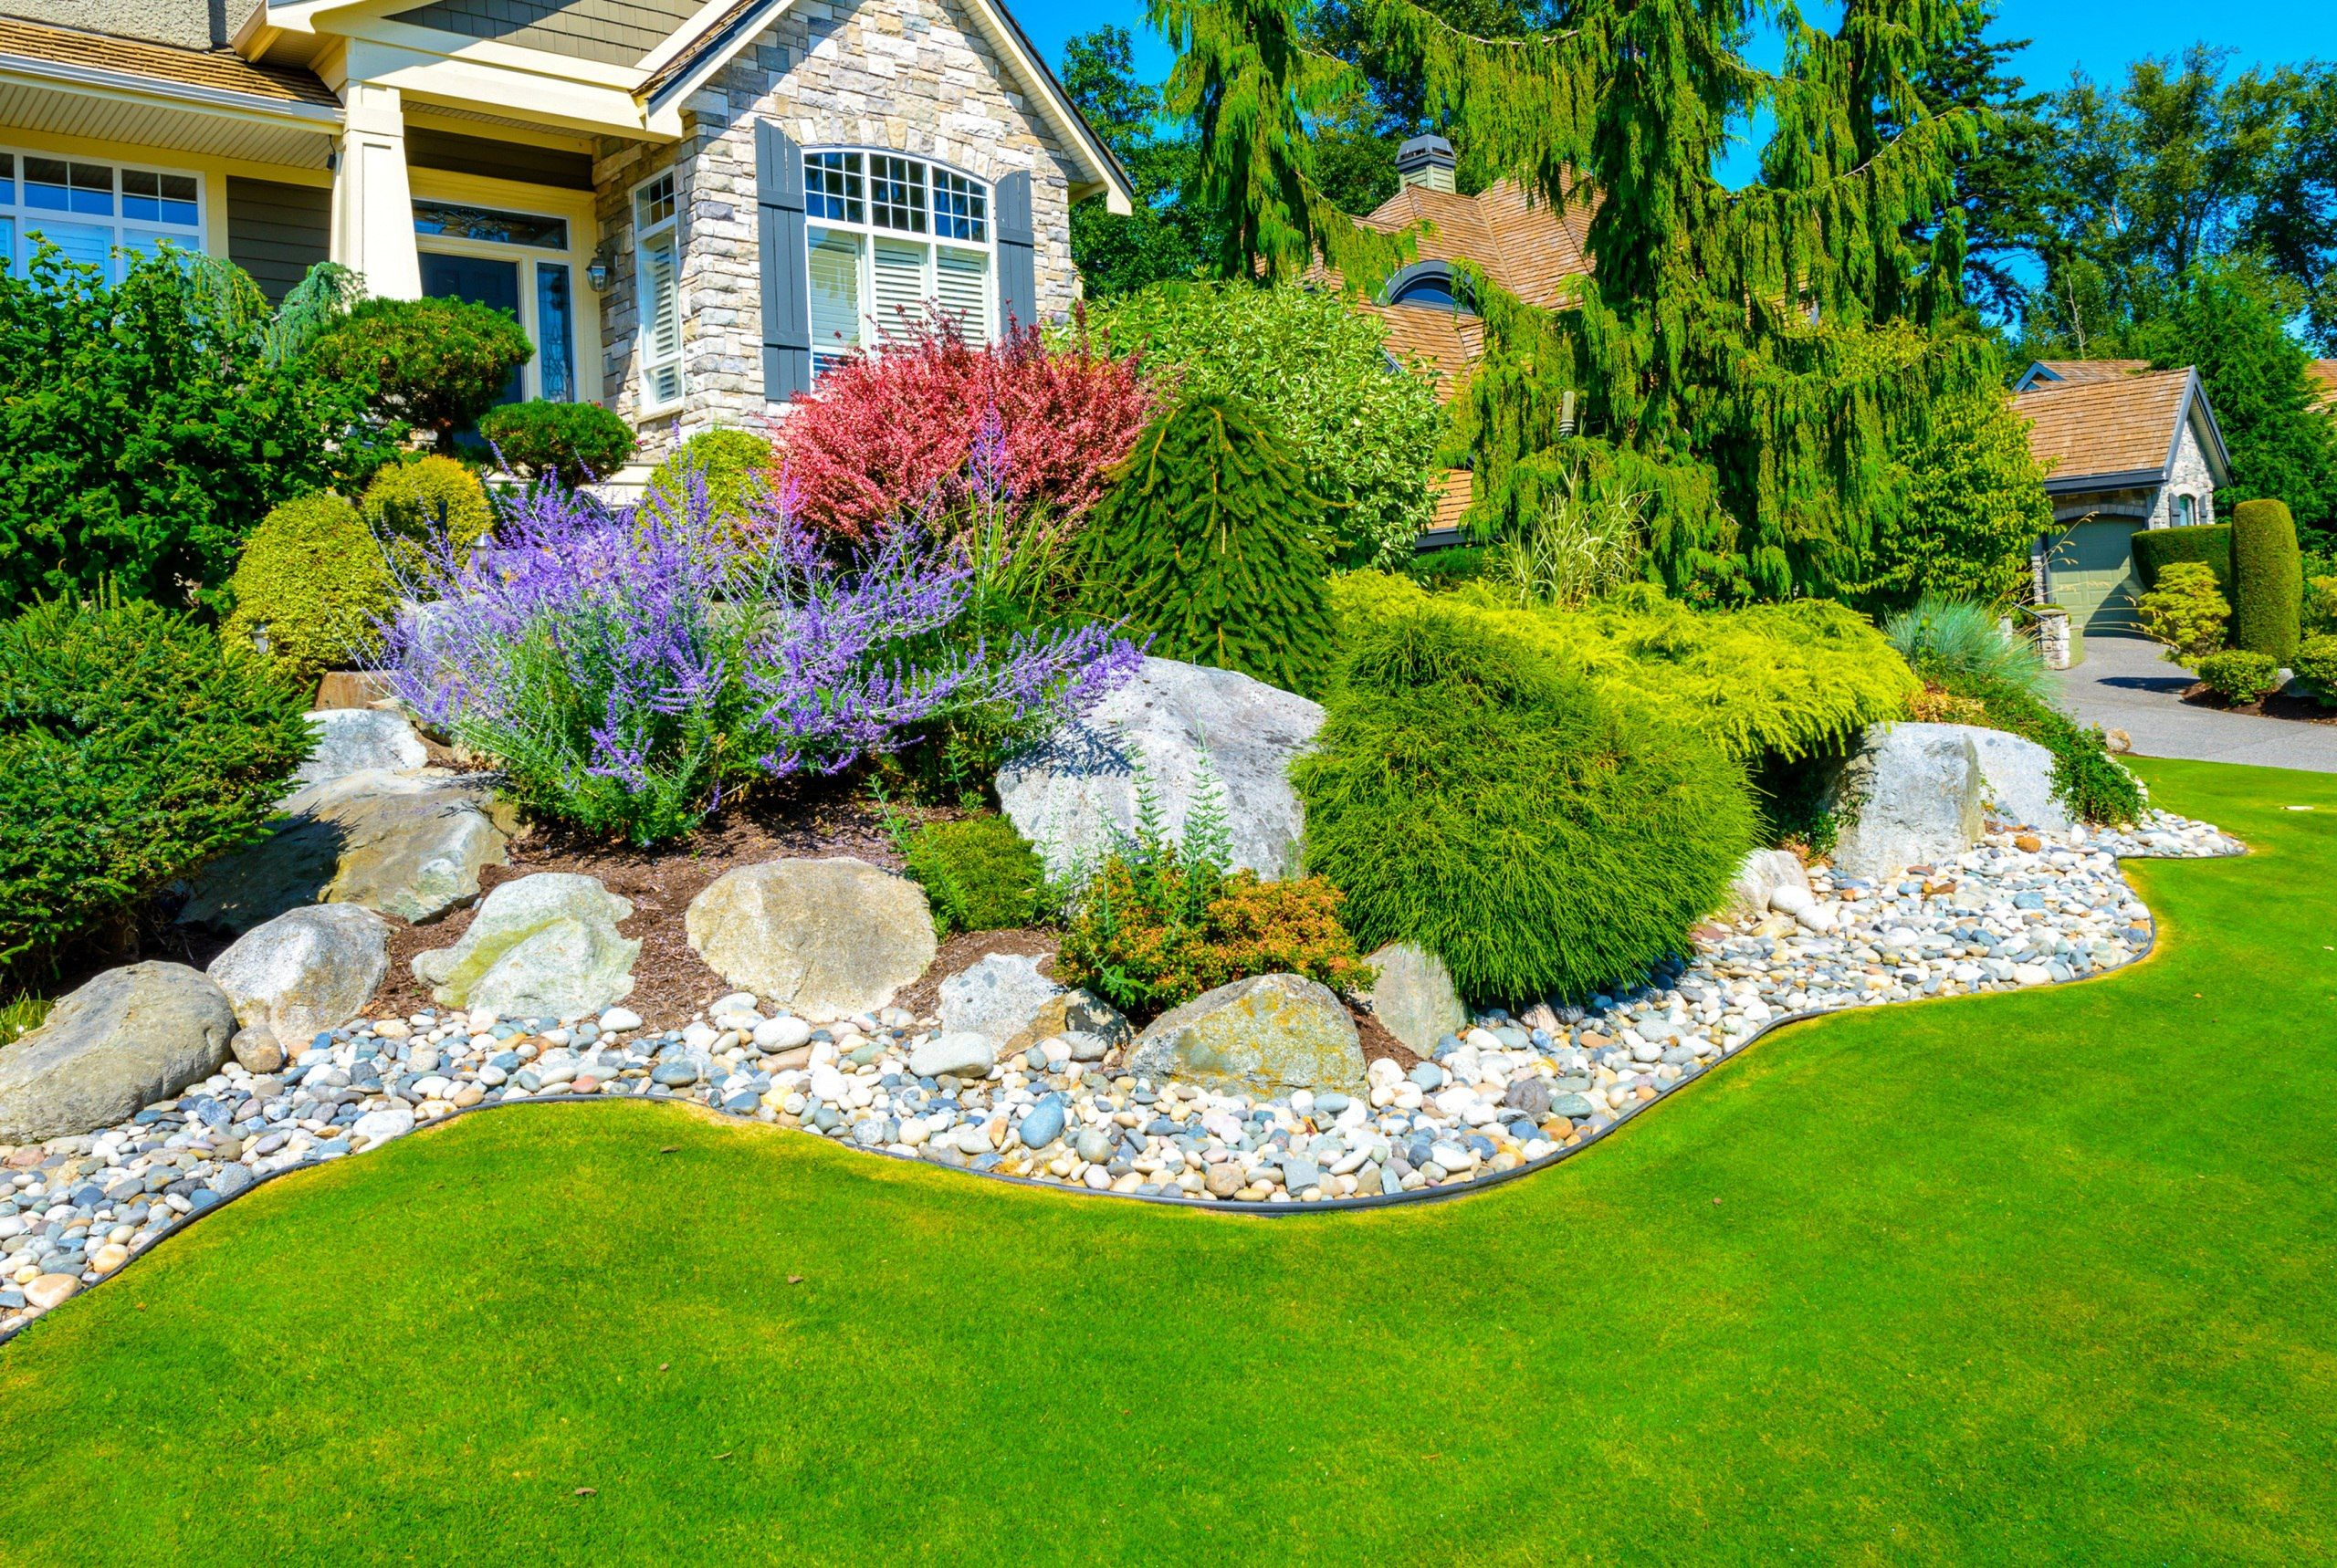 - Zahrady  Garden - Pinterest - Gardens, Landscaping And